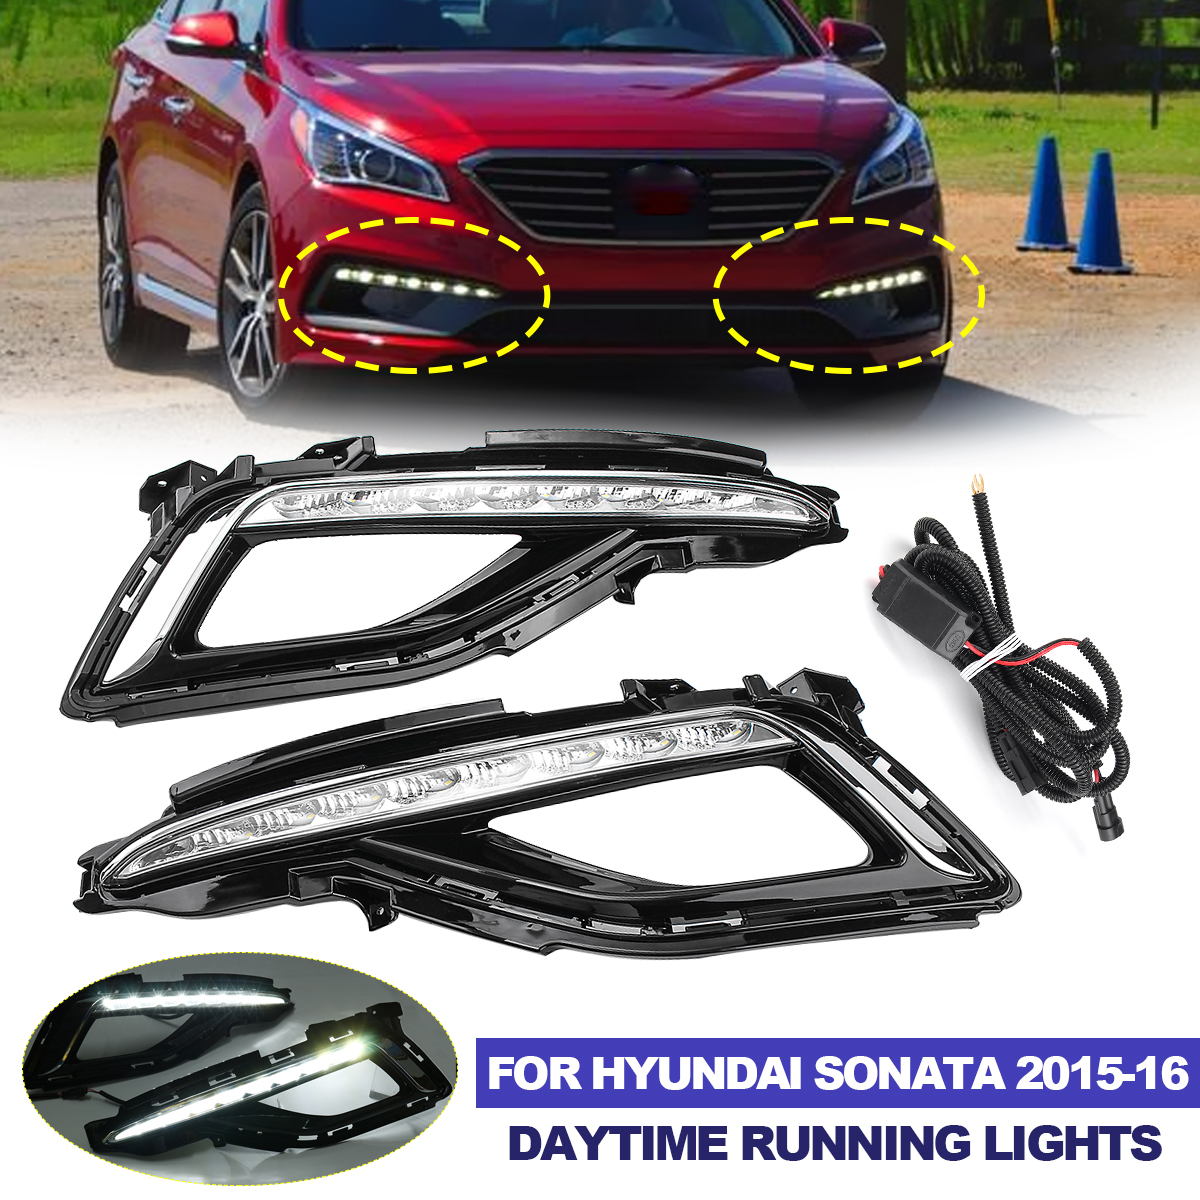 Front Molding Cover Trim for 2015-2017 Hyundai Sonata MK9 Lower Bumper Protector